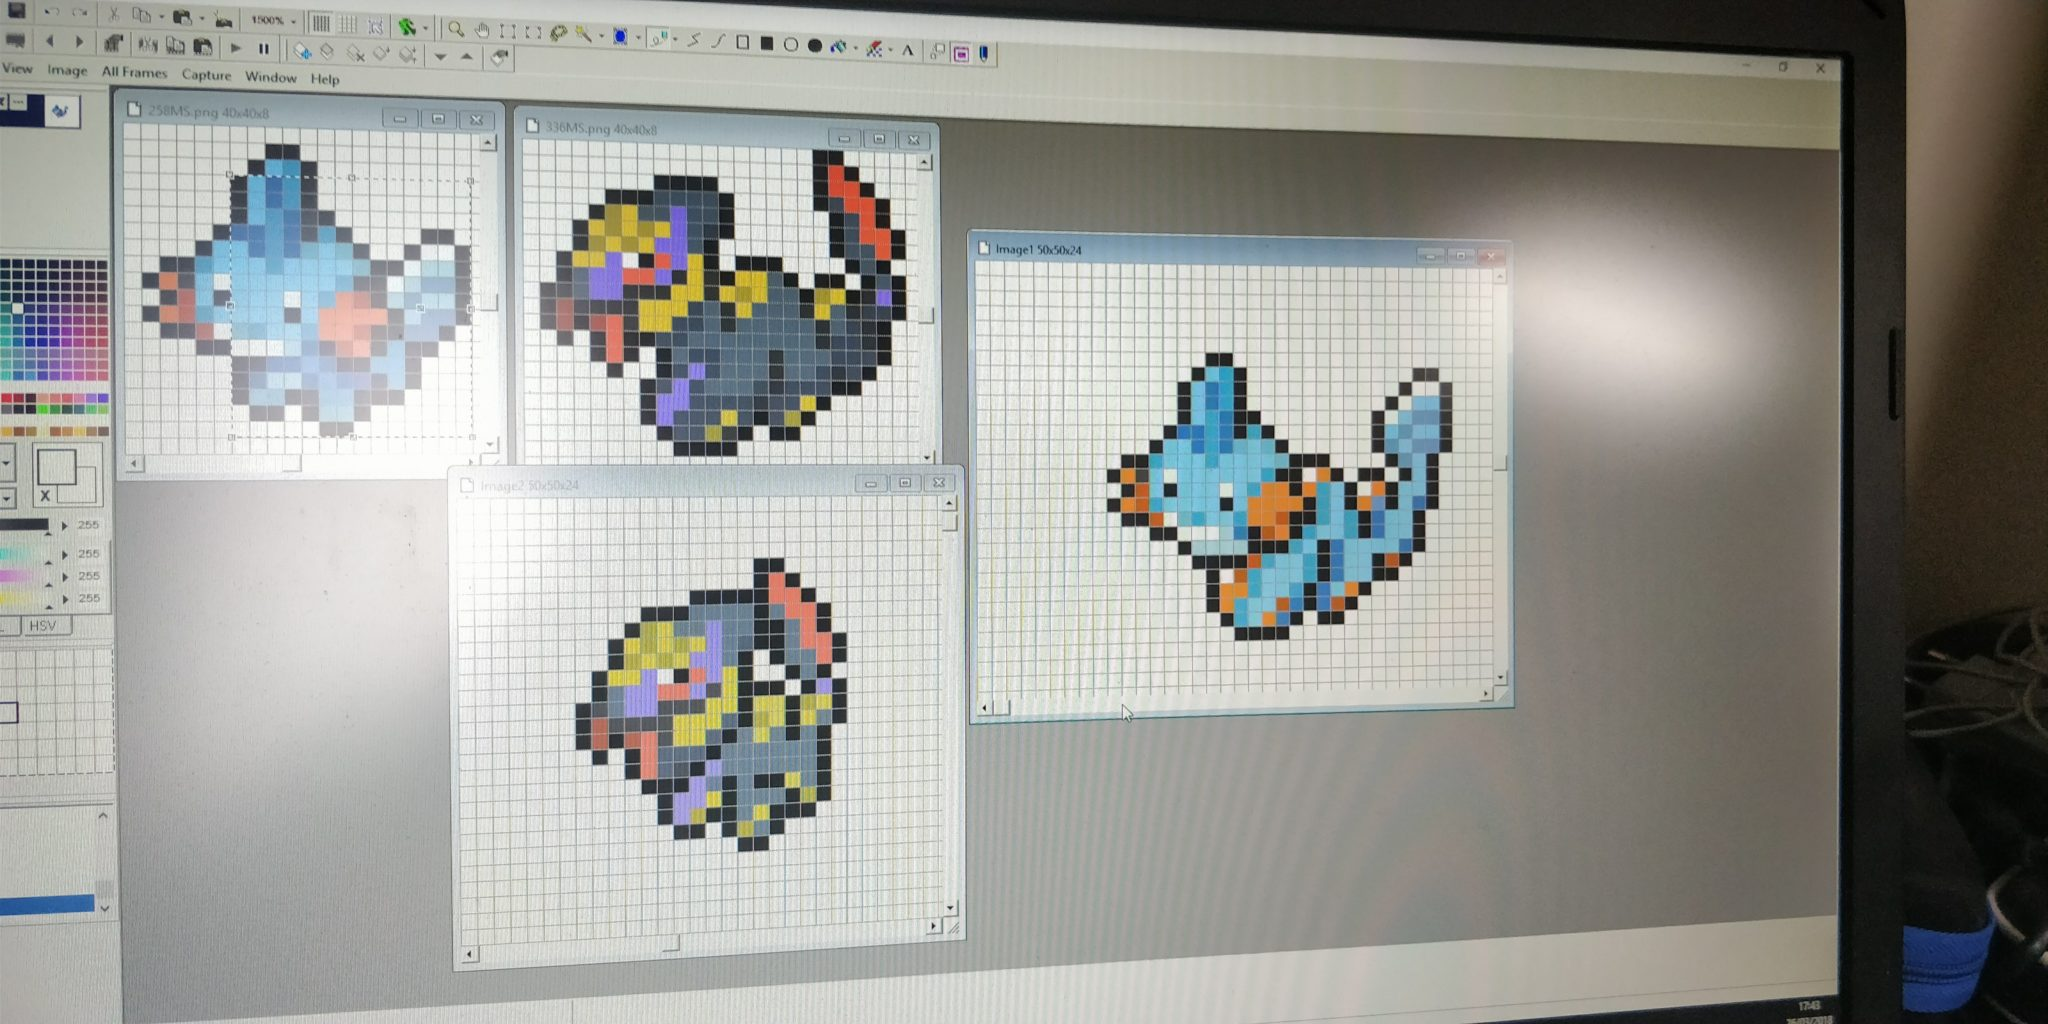 pixel-pixelart-pixelcraft-pixelbeads-perlers-perlerbeads-perlerart-beads-beadspearls-hama-hamabeads-hamasprites-hamacrafts-hamaperler-artkal-artkalbeads-fusebeads-8bit-retrogaming-gaming-perlercrafts-homemade-handmade-sprite-design-tutoriel-pattern-love-live-sunshine